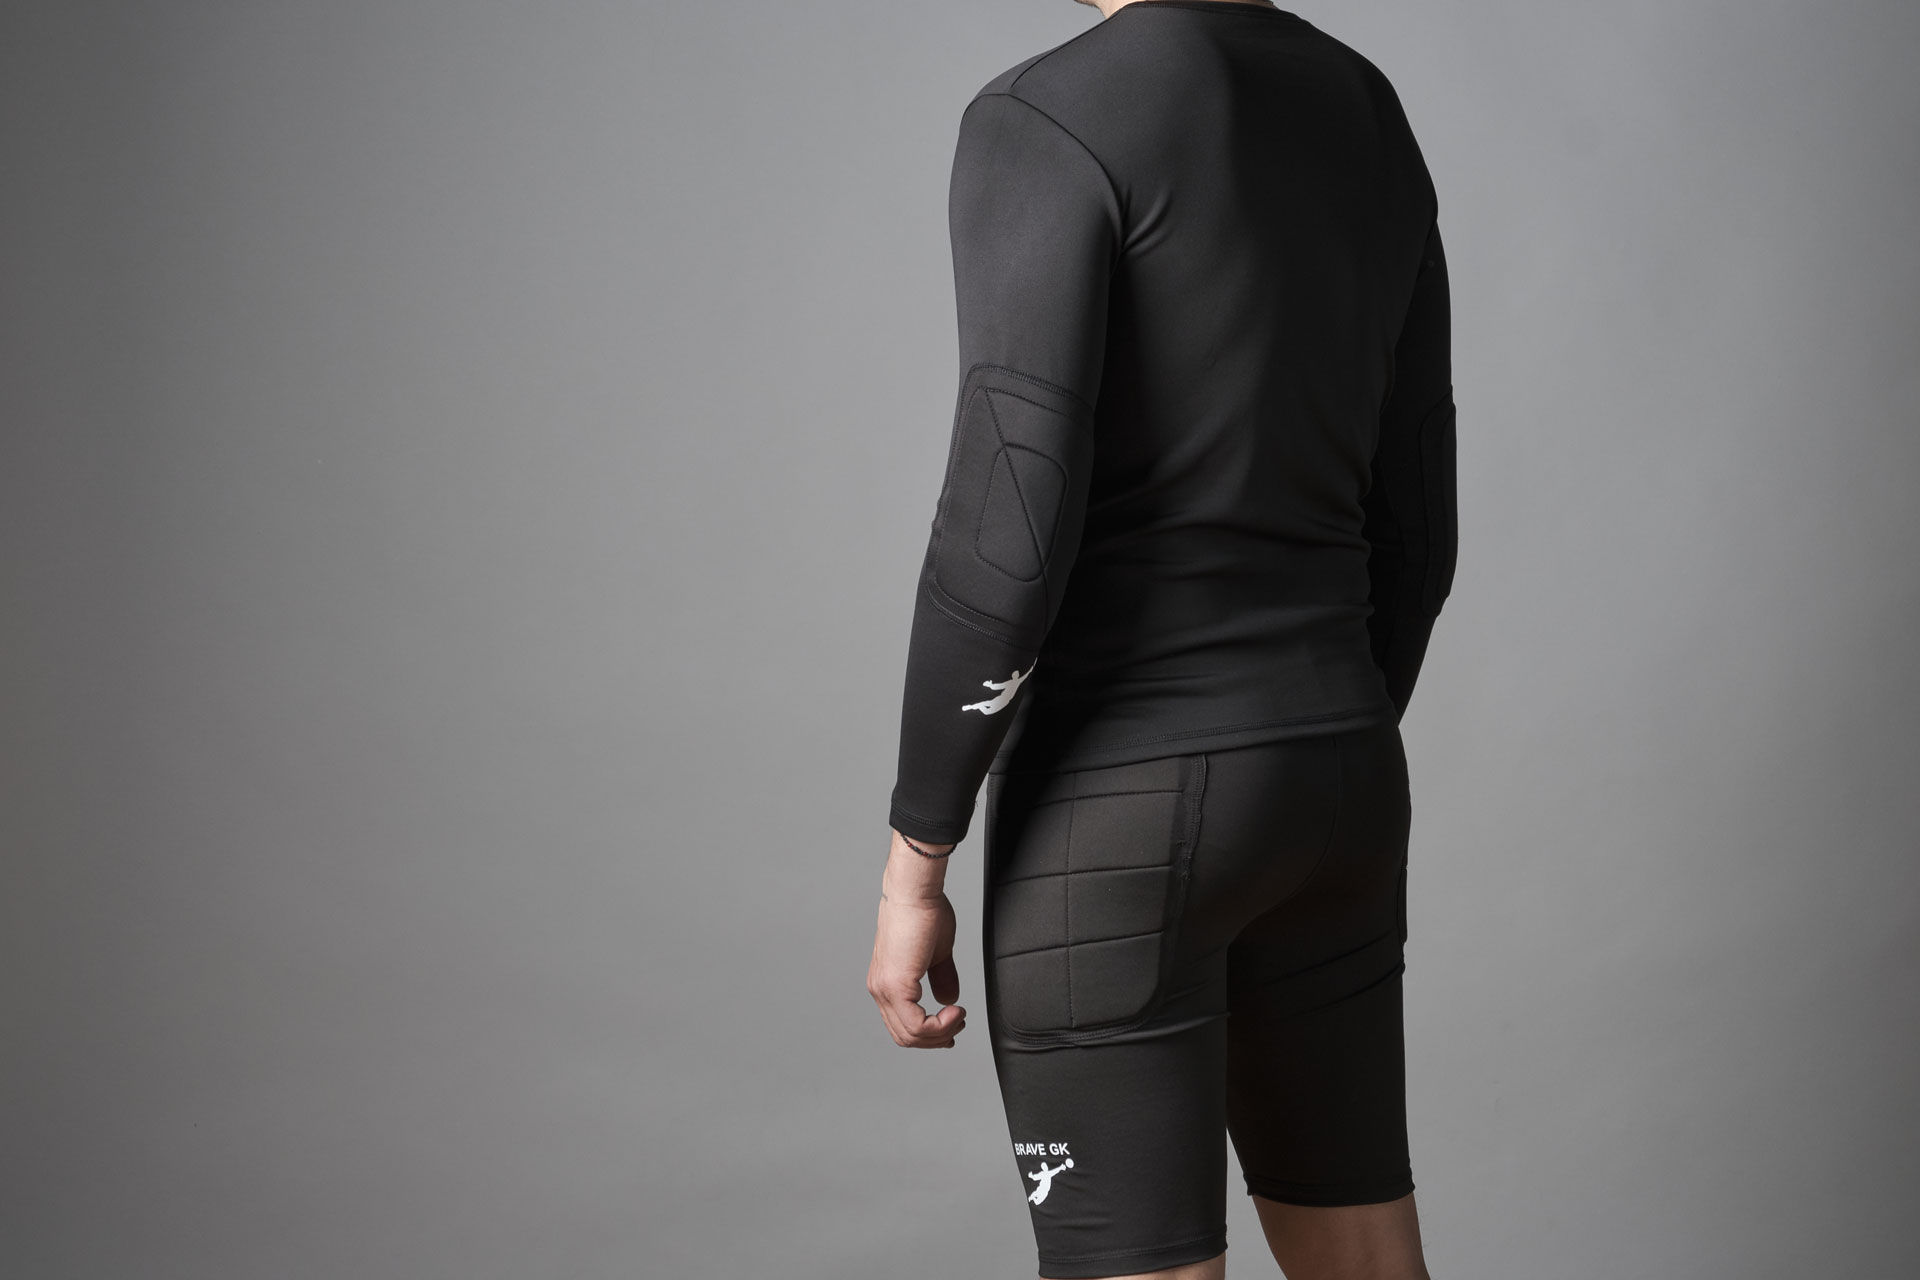 Thermal underwear for goalkeepers Brave GK-online store Brave GK